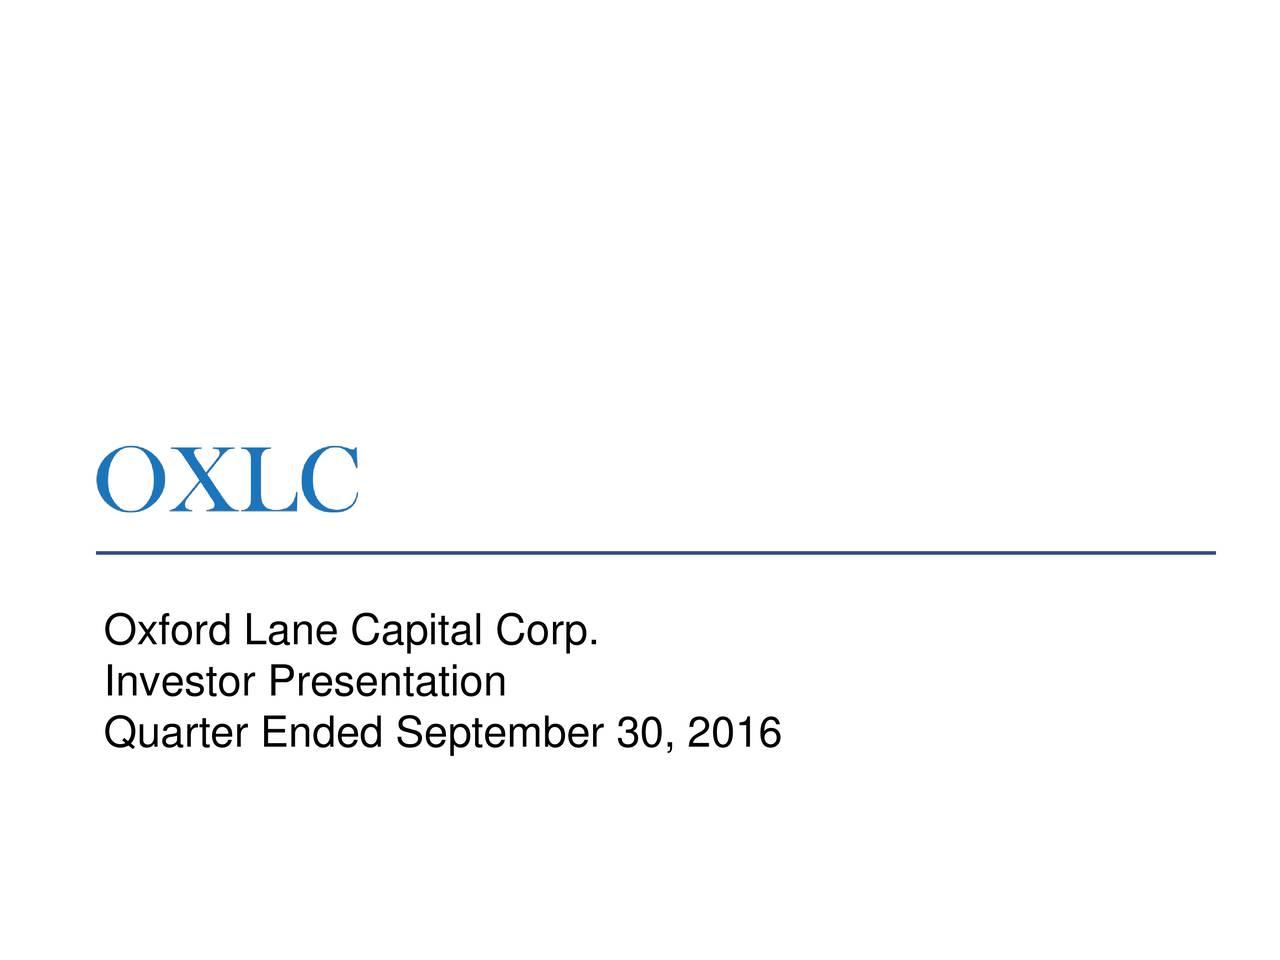 Investor Presentation Quarter Ended September 30, 2016